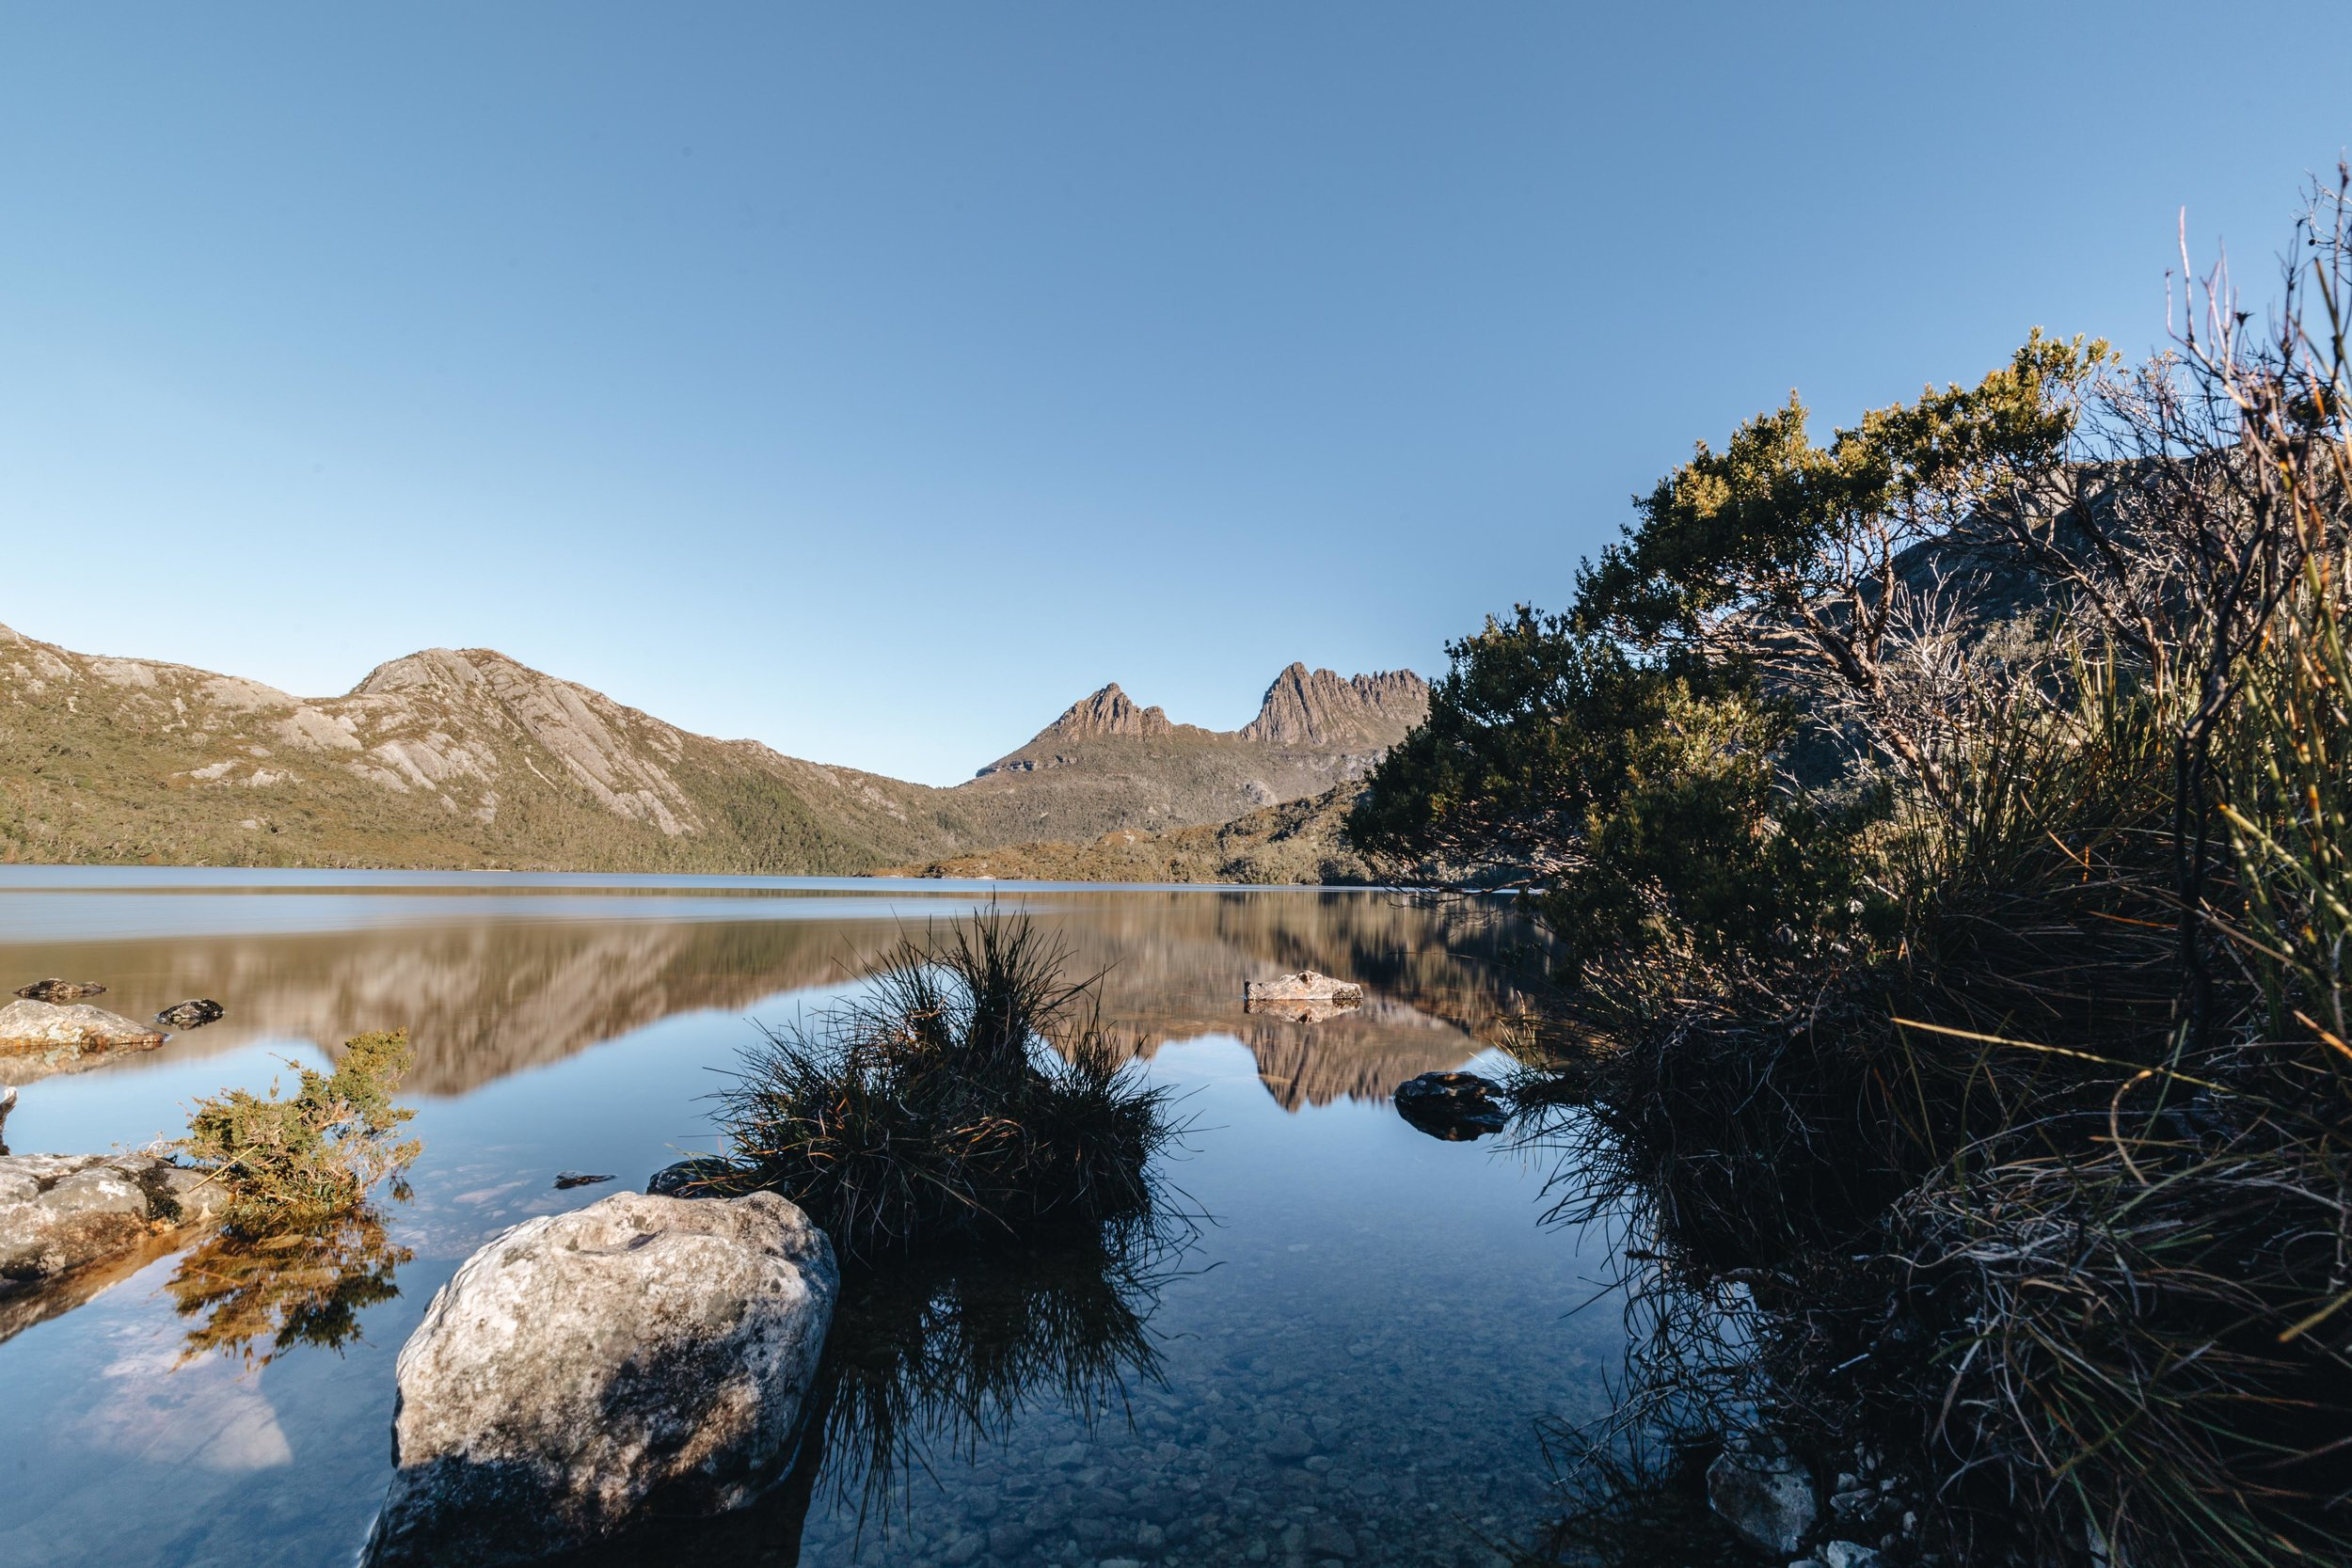 Tasmania - Cradle Mountain, Waterfalls + the Shore